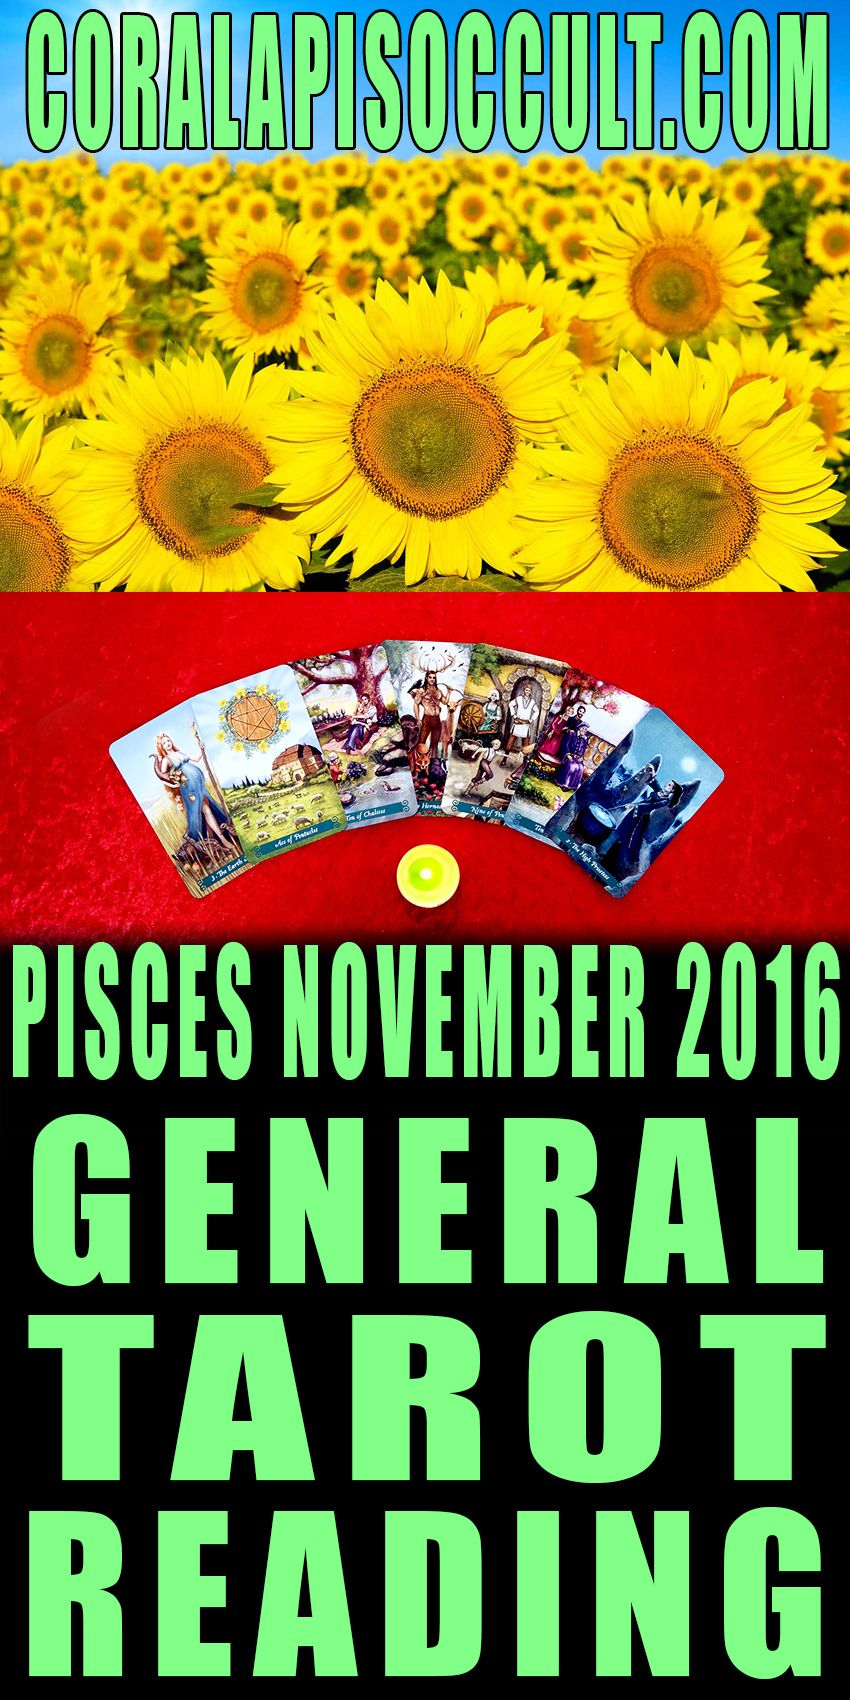 Pisces november 2016 tarotscope tarot reading for